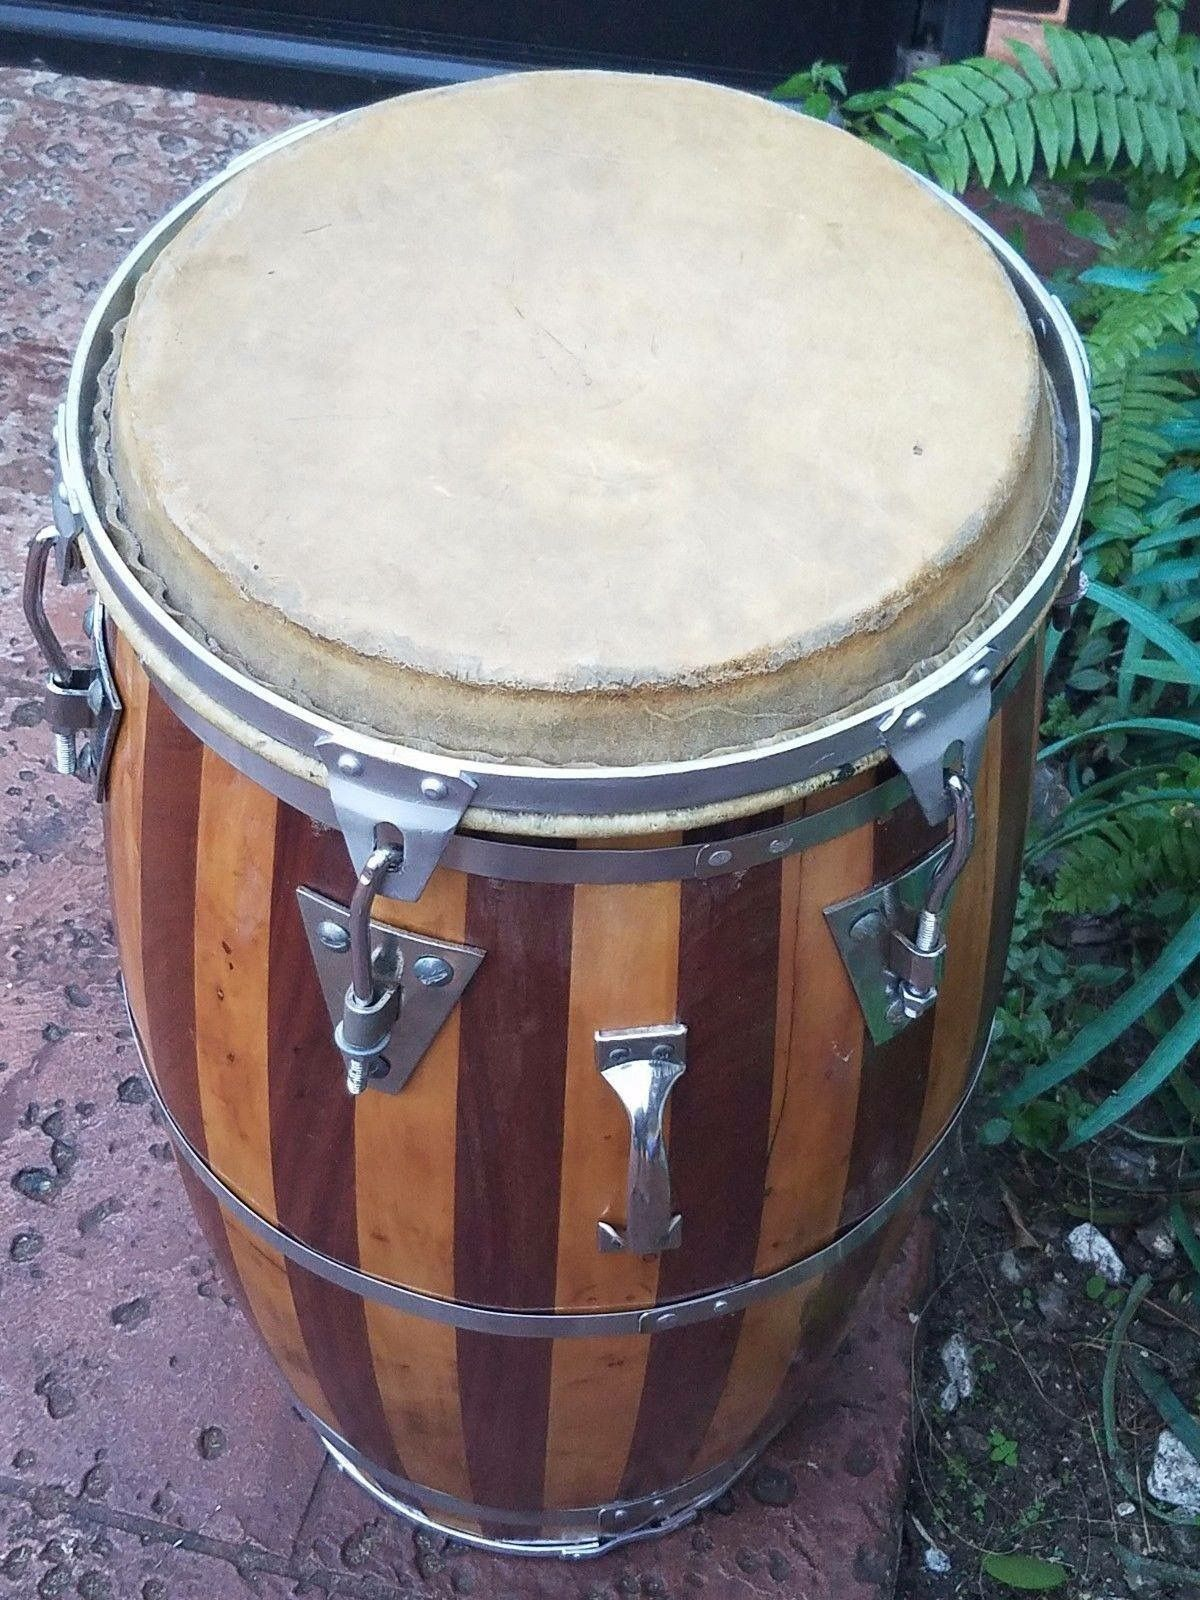 Drums, Congas, Drum Sets, Drum Kit, Drum